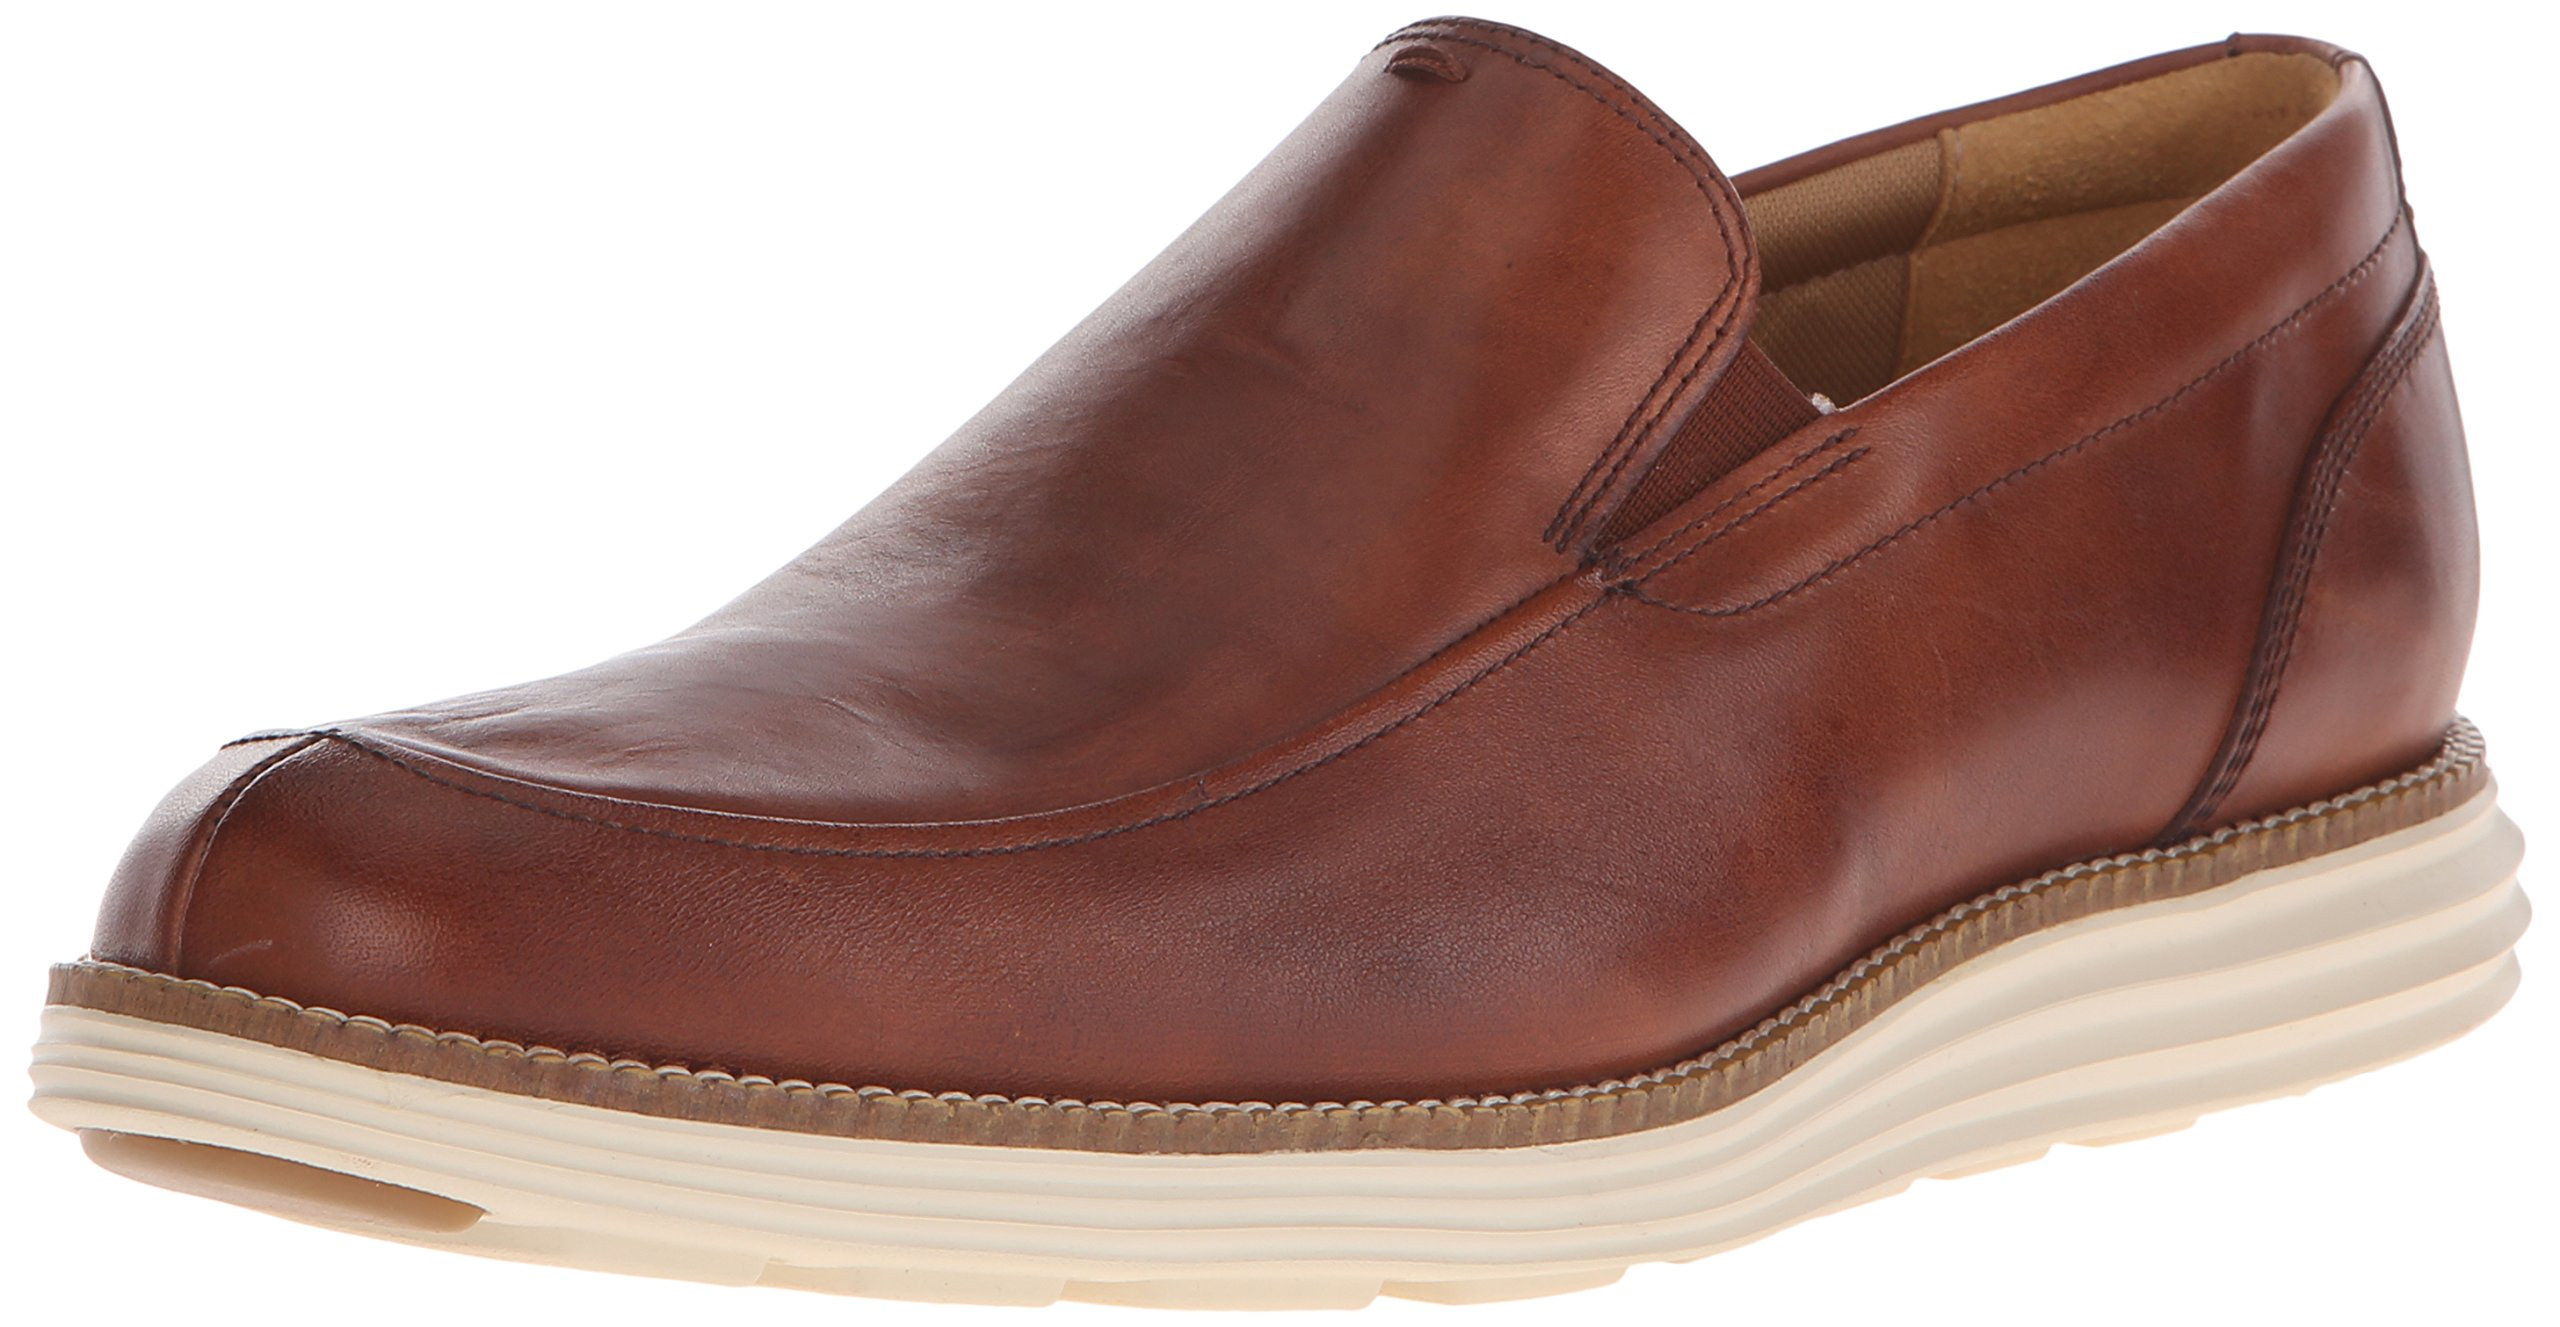 Slip On Garden Shoes Amazon